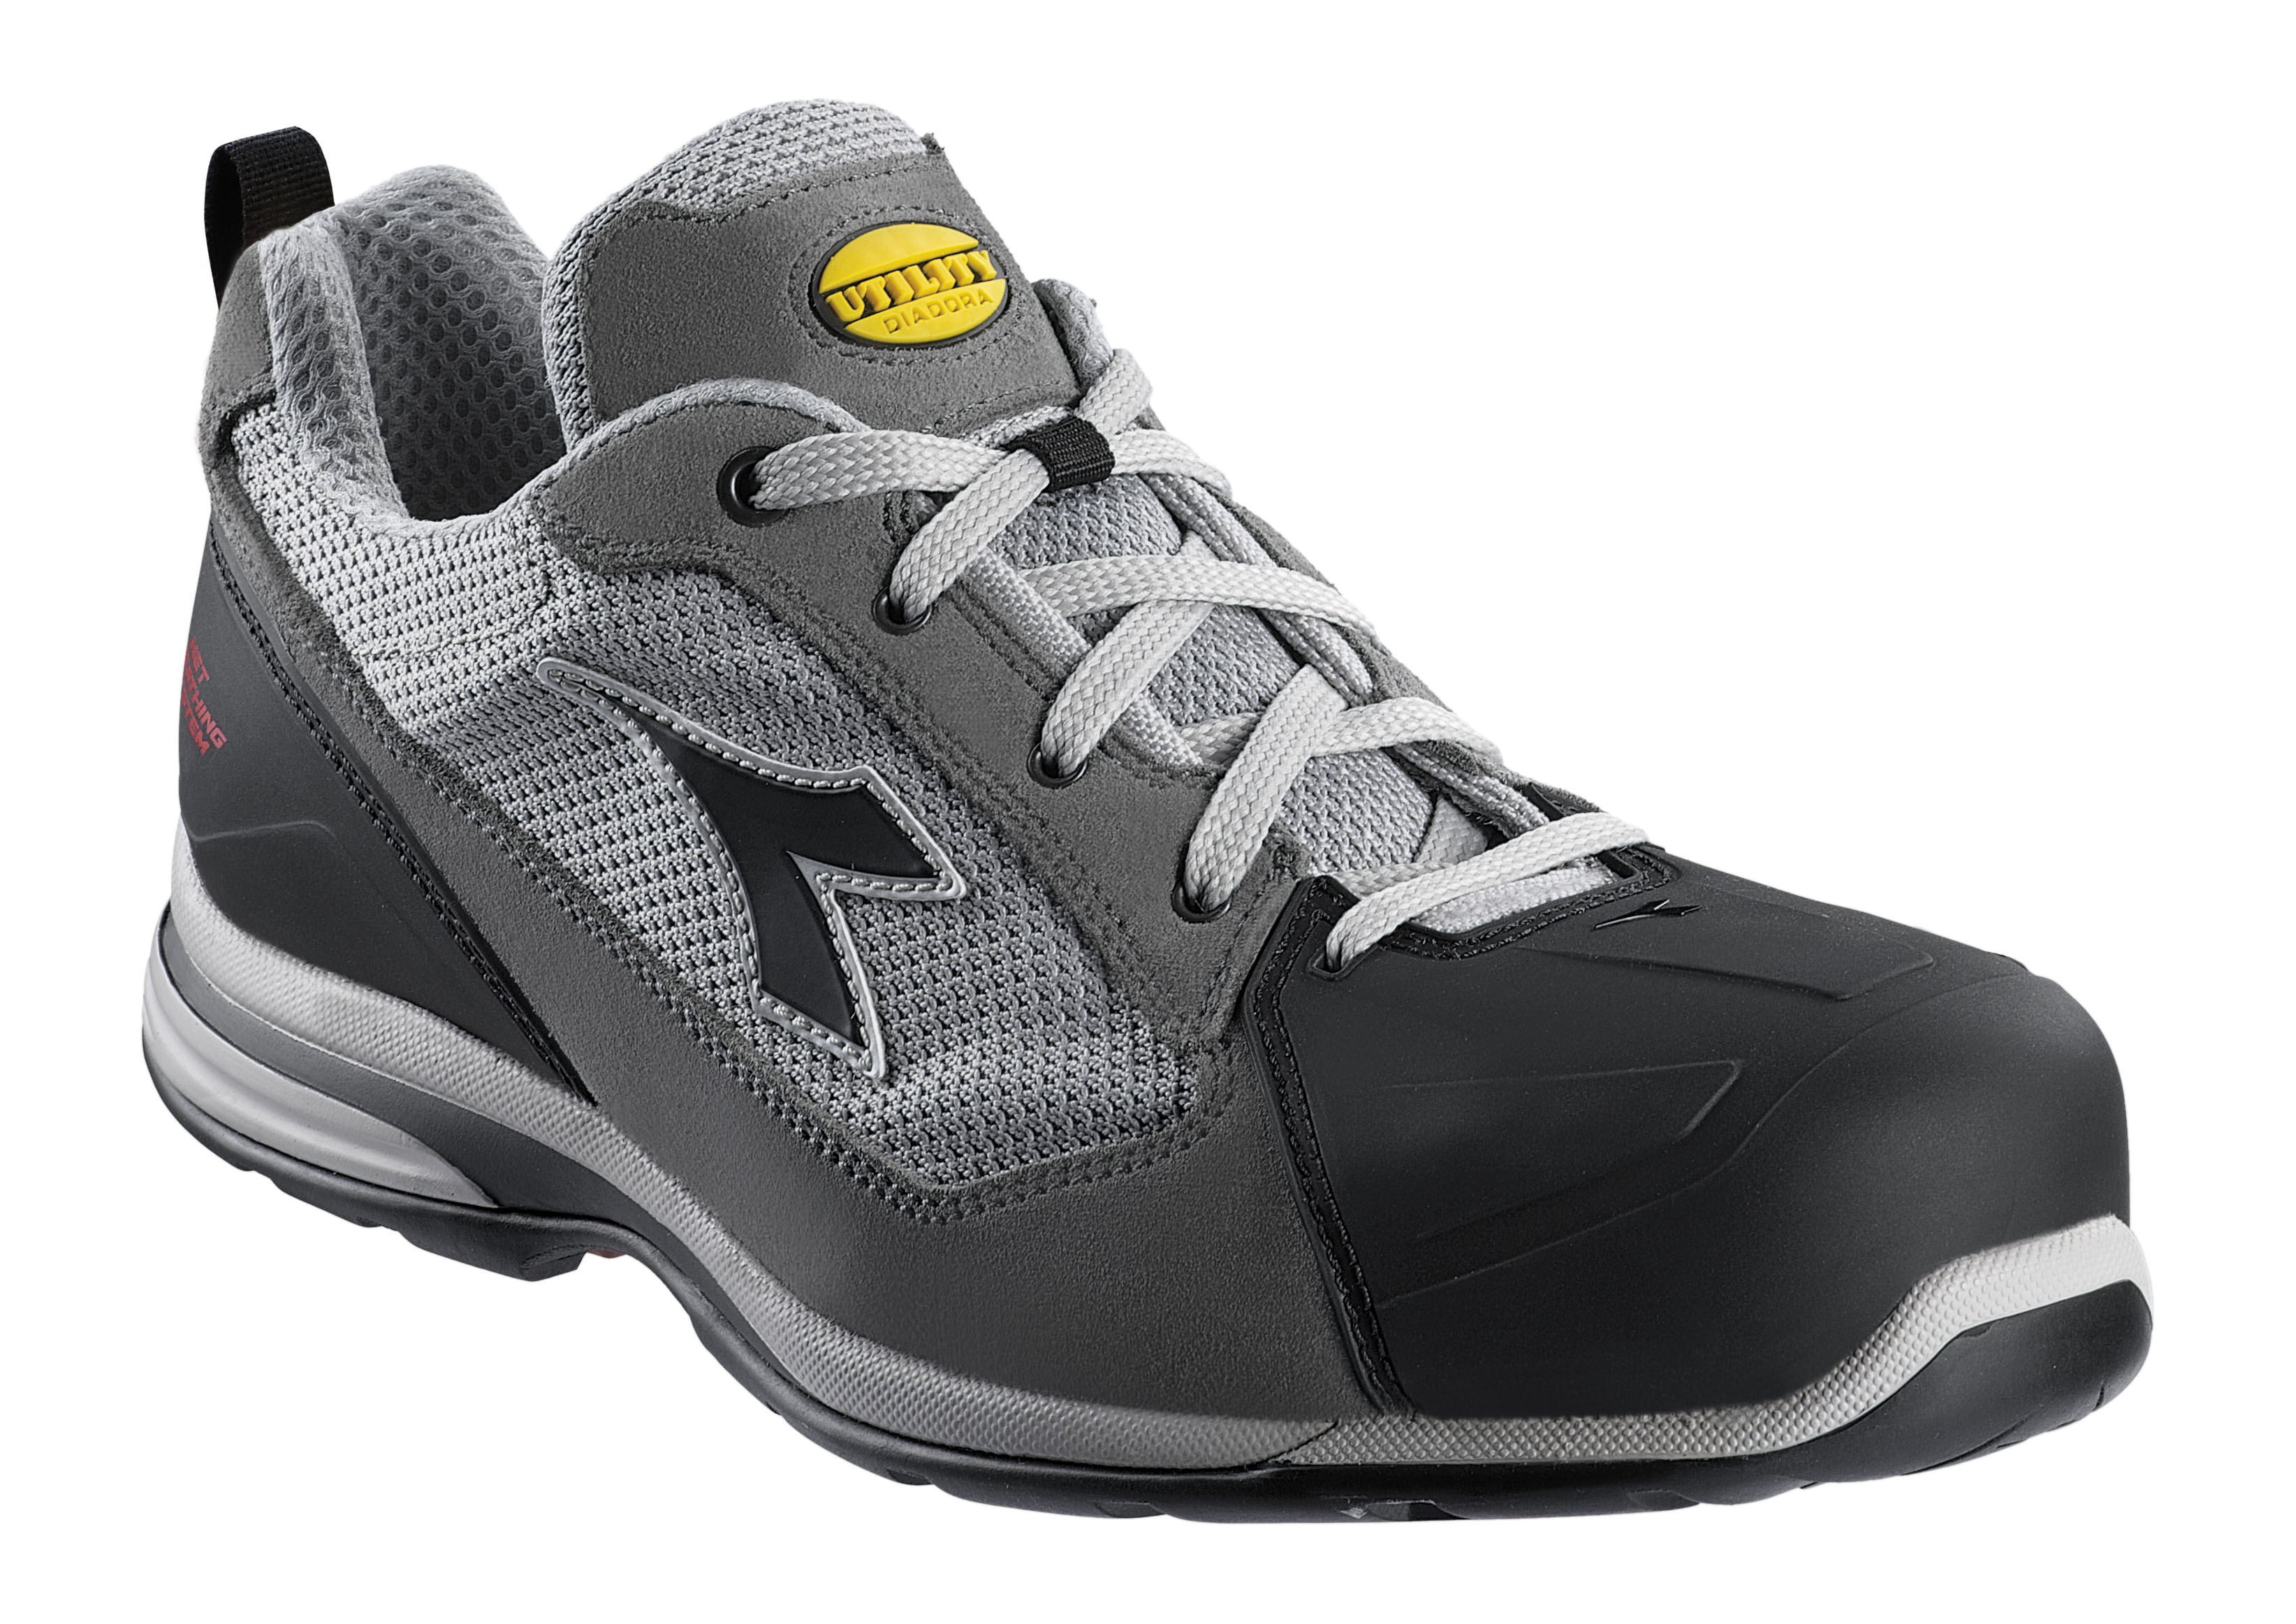 Diadora Unisex Adults Run Textile ESD Low S1p Work Shoes